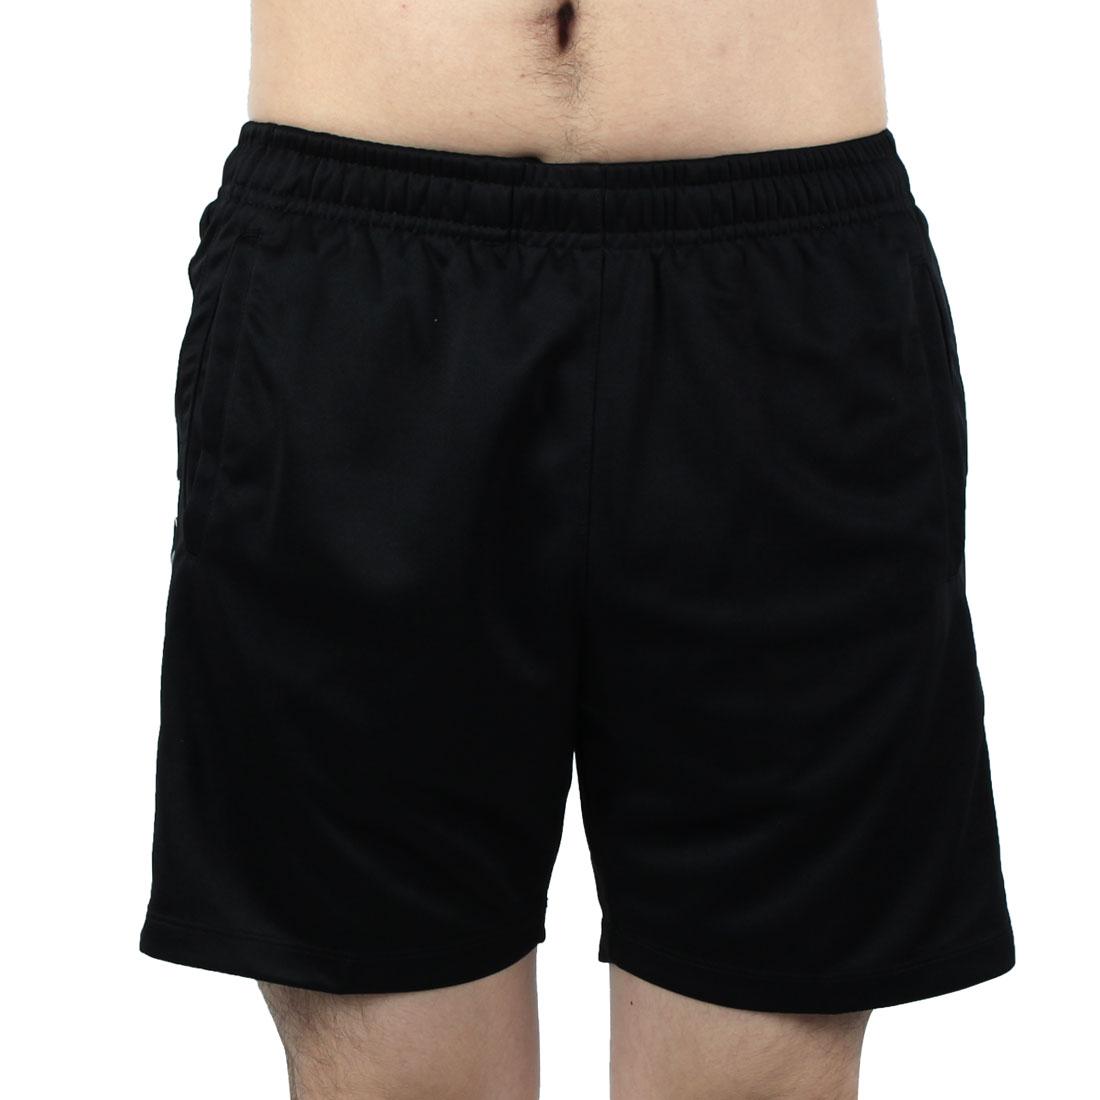 85427655b45e Outdoor Activities Athletic Baseball Basketball Biking Pocket Breathable  Pantie Men Sports Shorts W33 Black 0